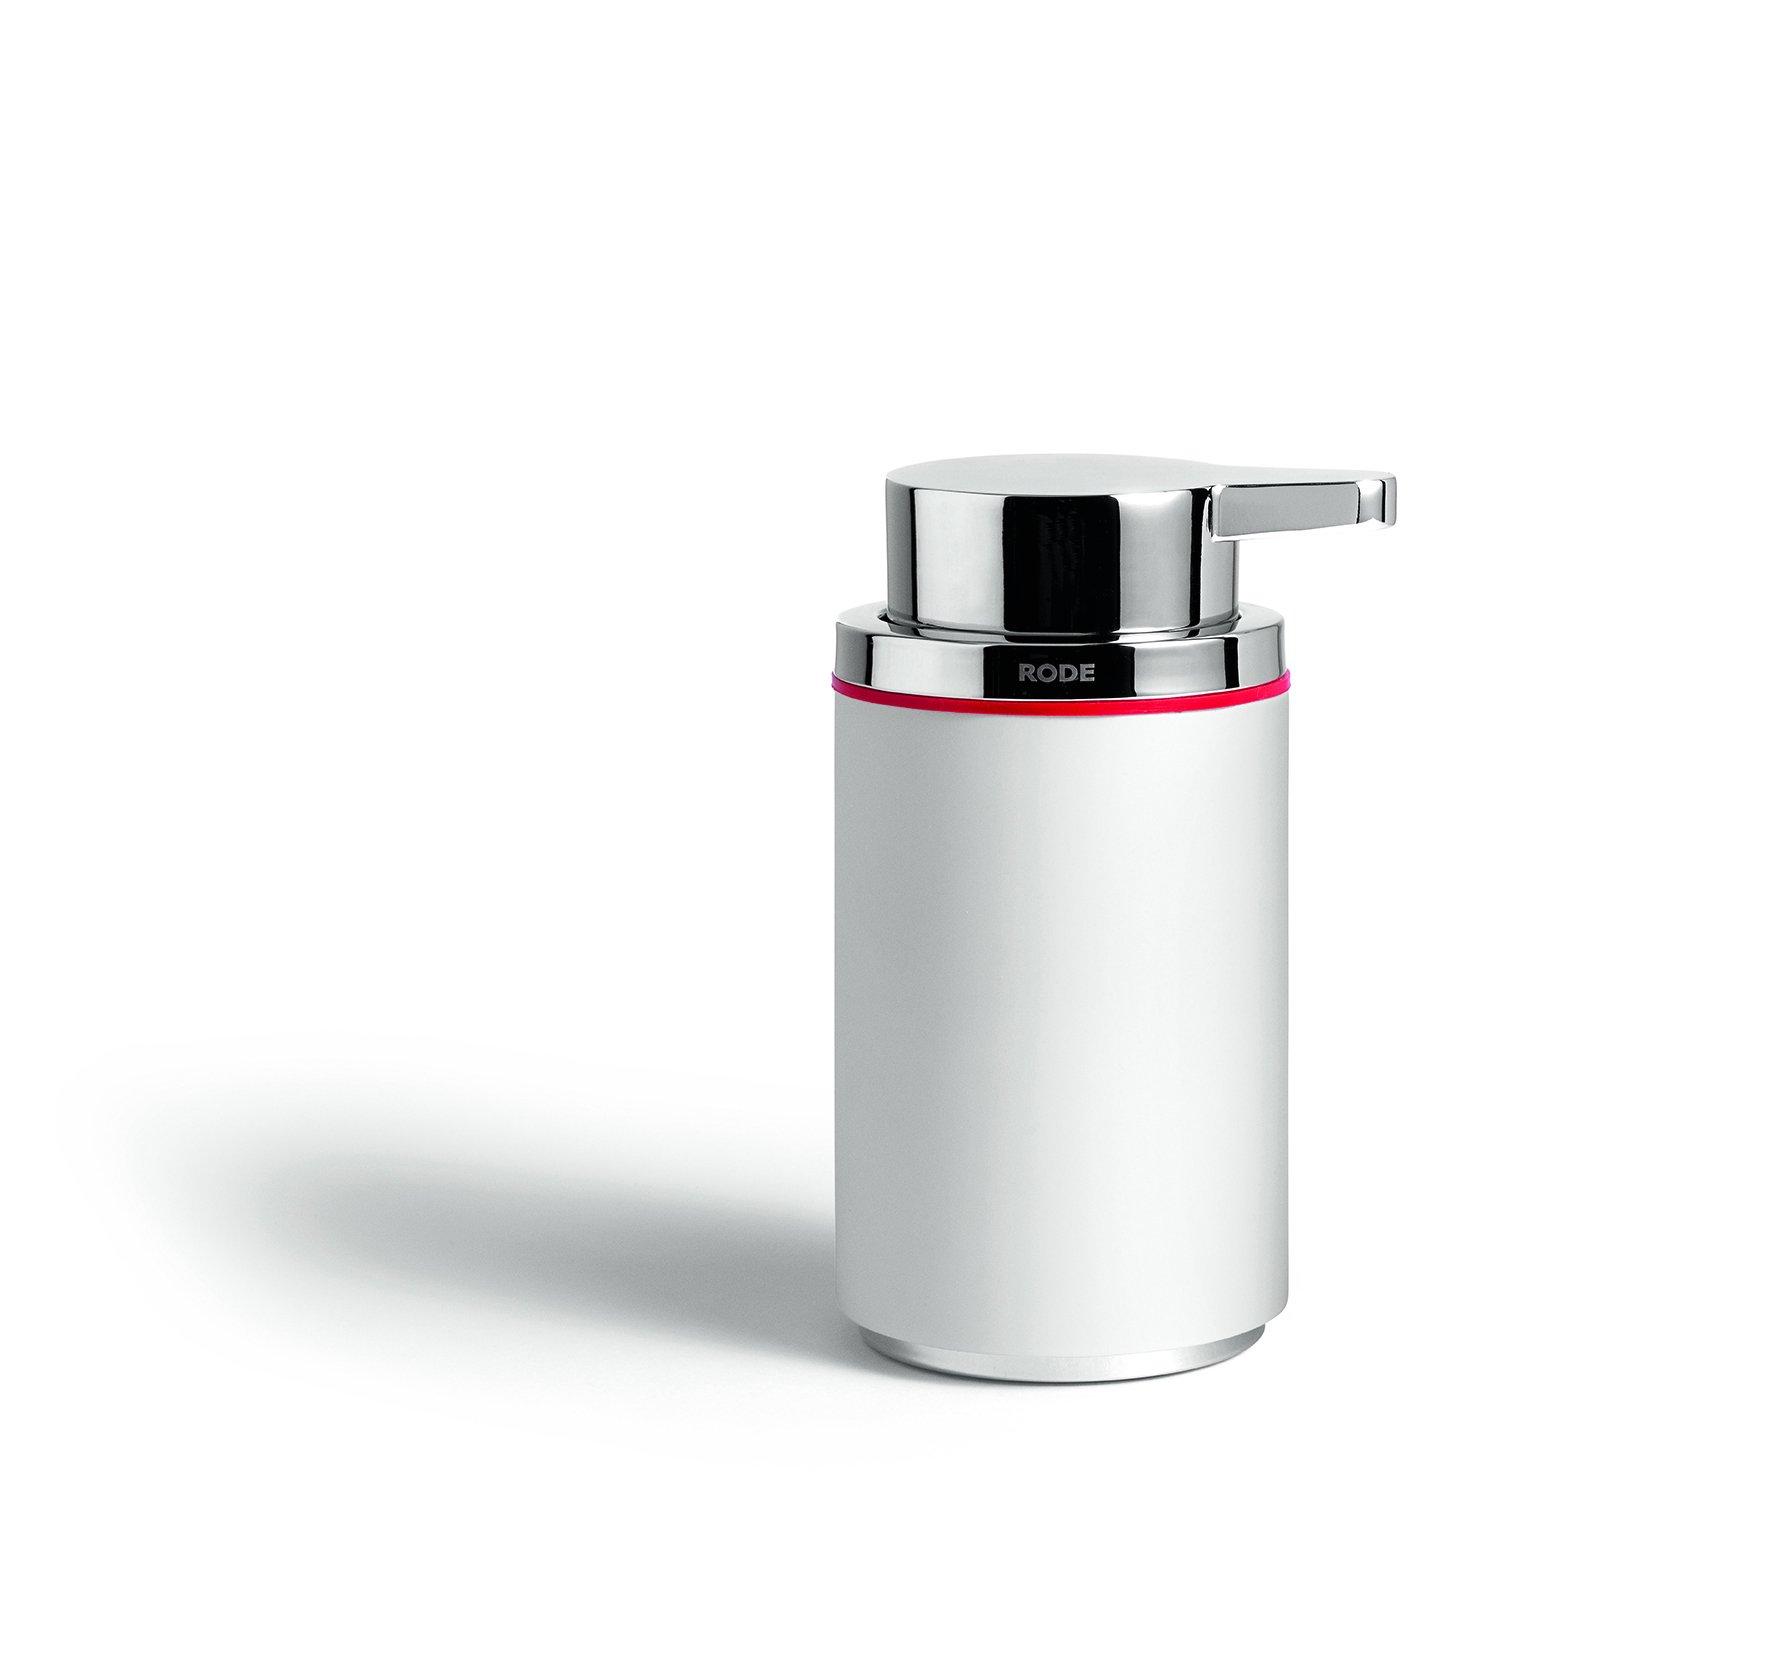 Rode Bath Mafalda Soap Dispenser 250Ml, Colour- White, One Size